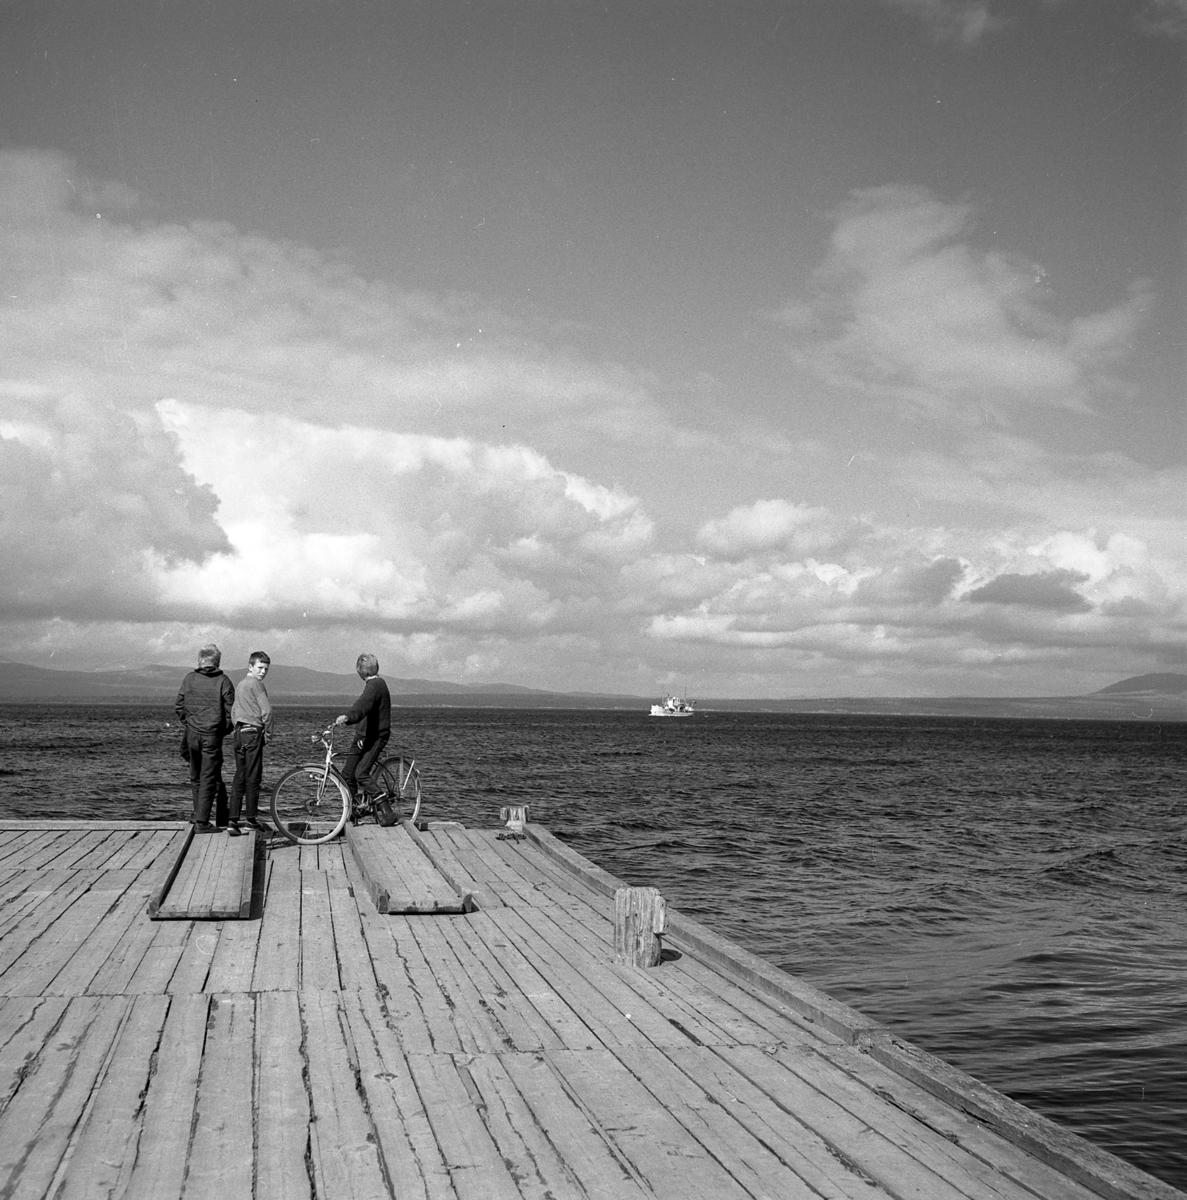 Barn ved sjø